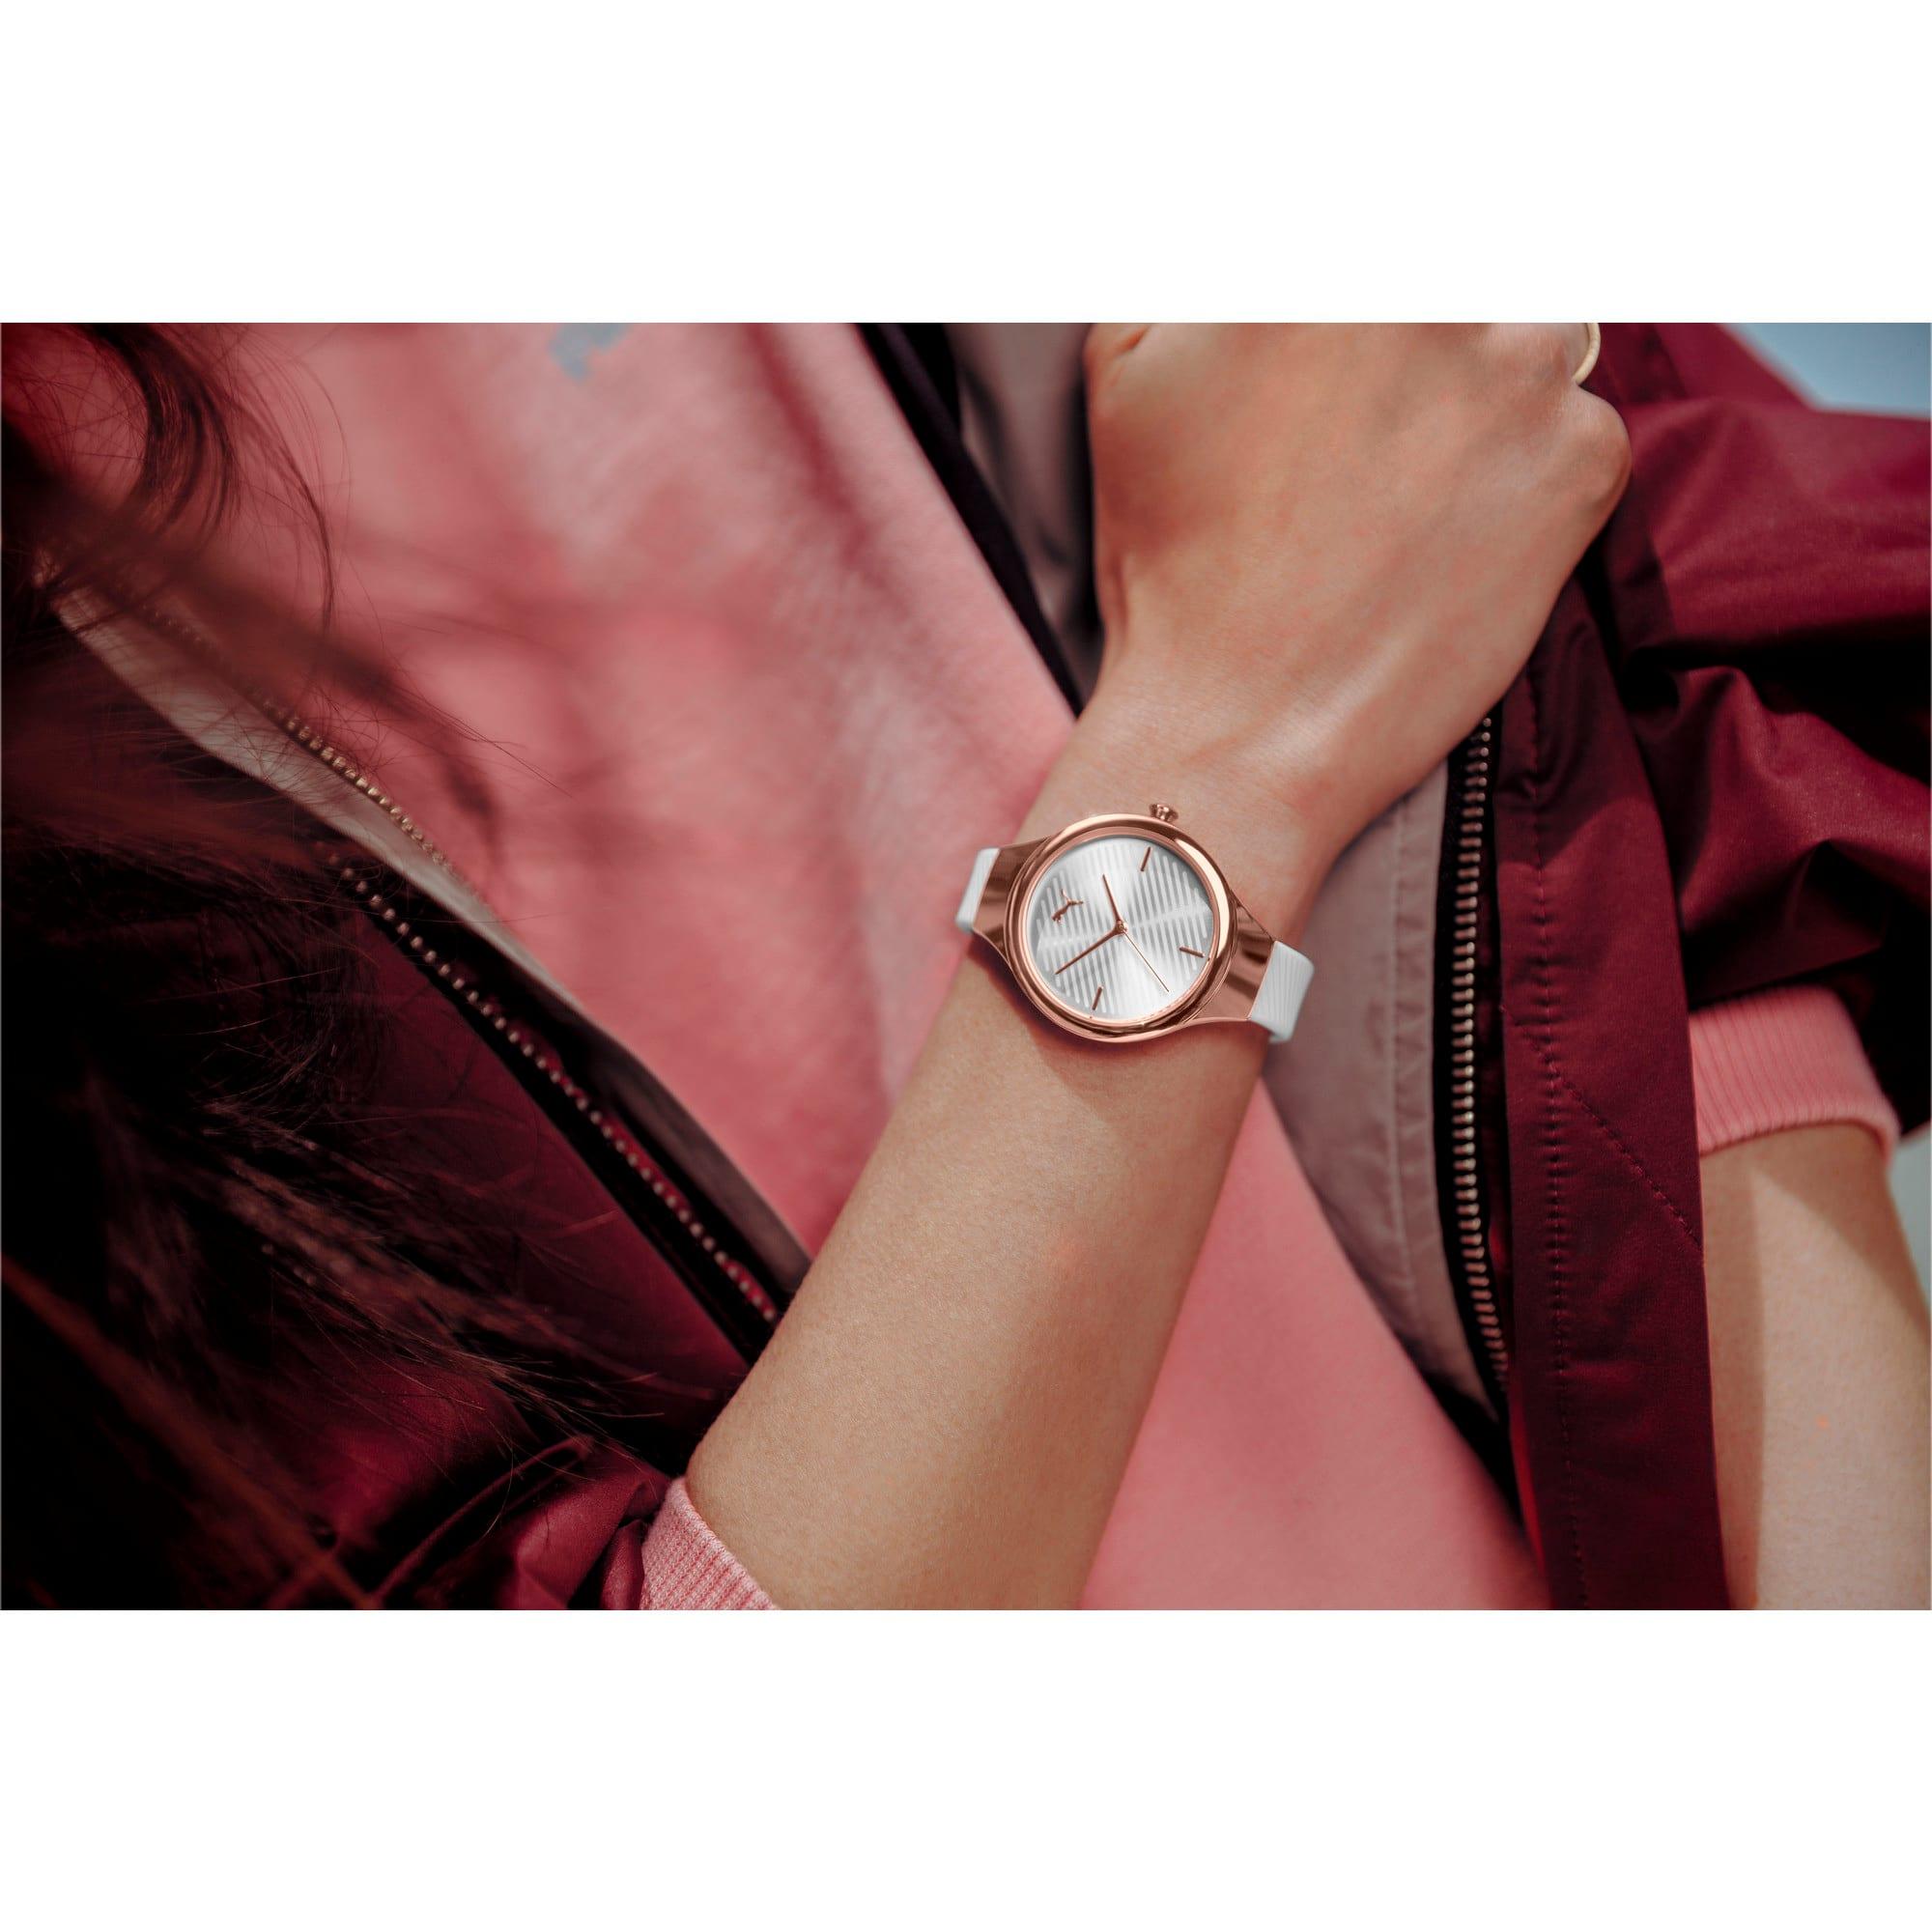 Thumbnail 5 of CONTOUR Ultra-Slim Damen Uhr, Rose gold/White, medium